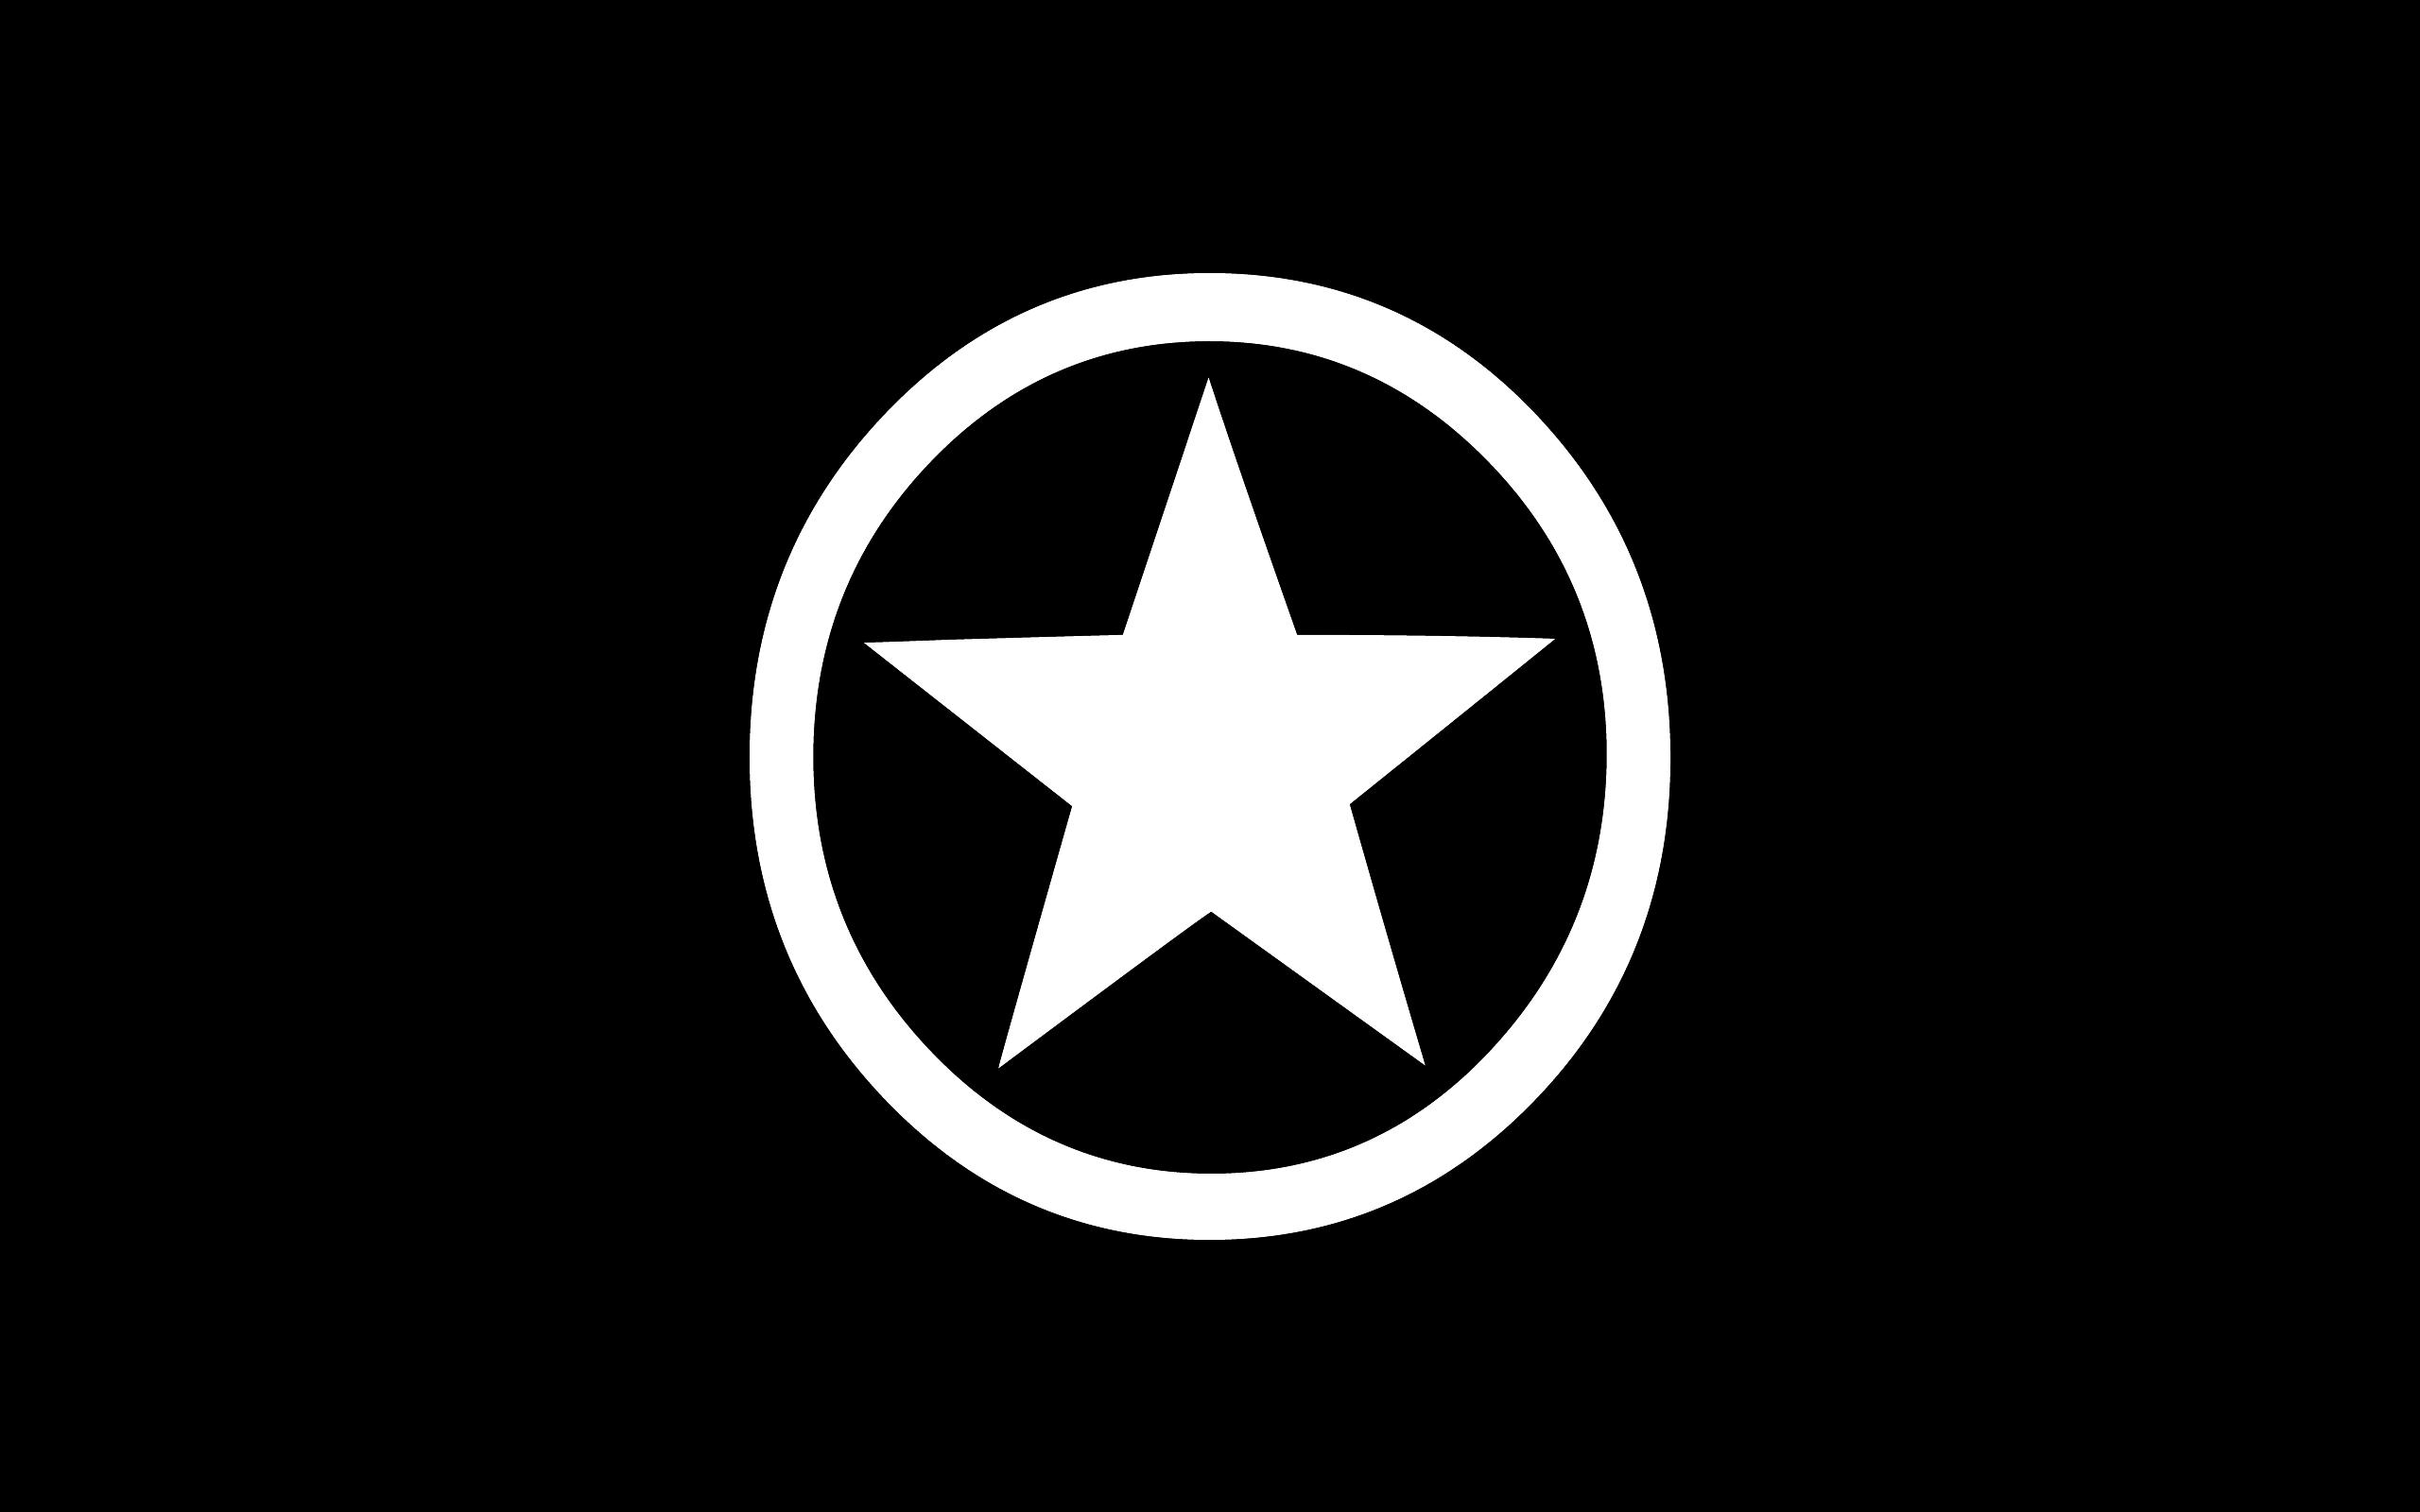 7e3499e5bc3f All Star Converse White Logo on Black Wallpapers HD Desktop Widescreen